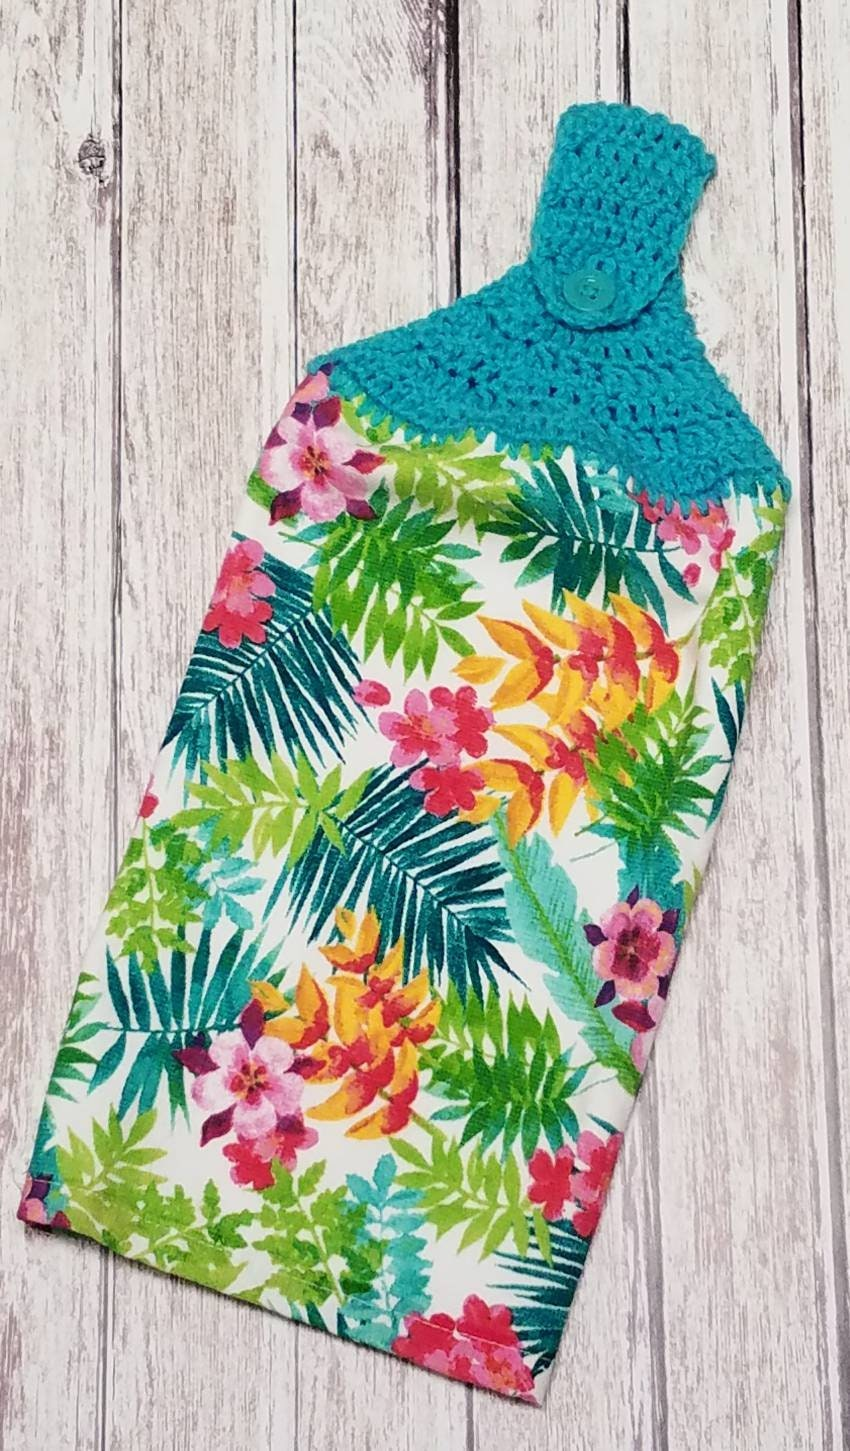 Crochet Hanging Kitchen Dish Towel Crochet Towel Topper